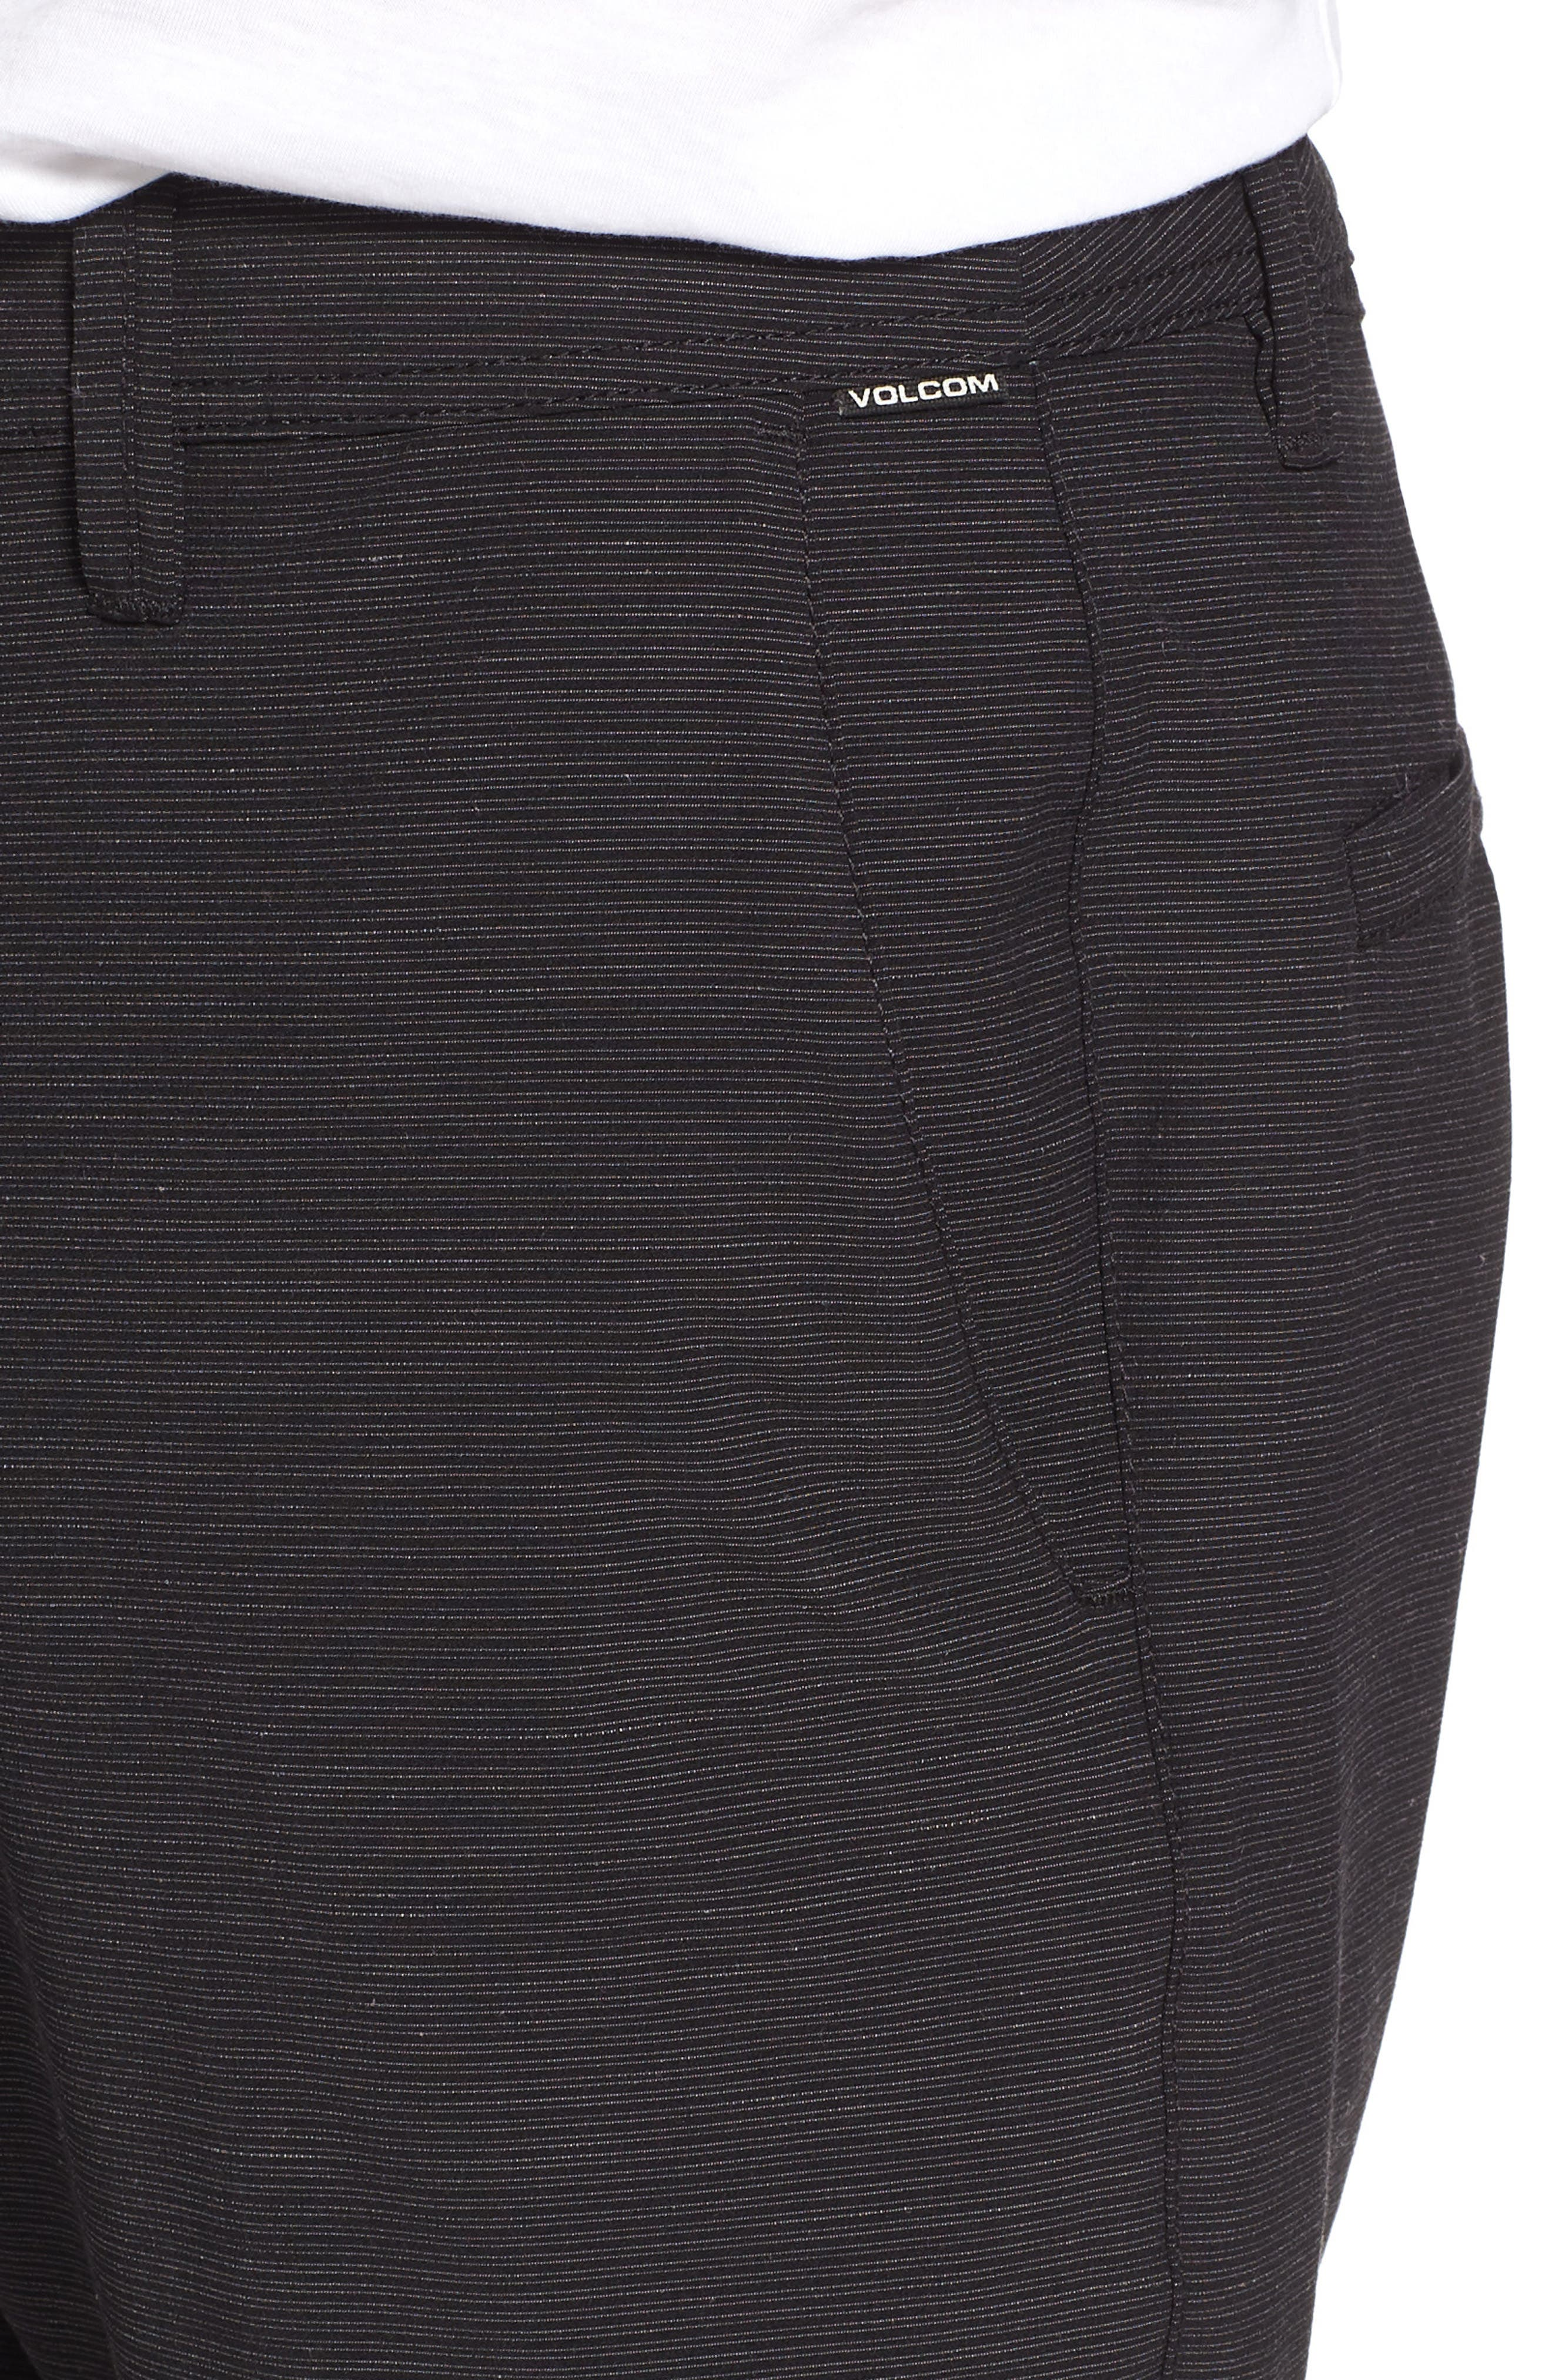 Surf N' Turf Slub Hybrid Shorts,                             Alternate thumbnail 4, color,                             BLACK